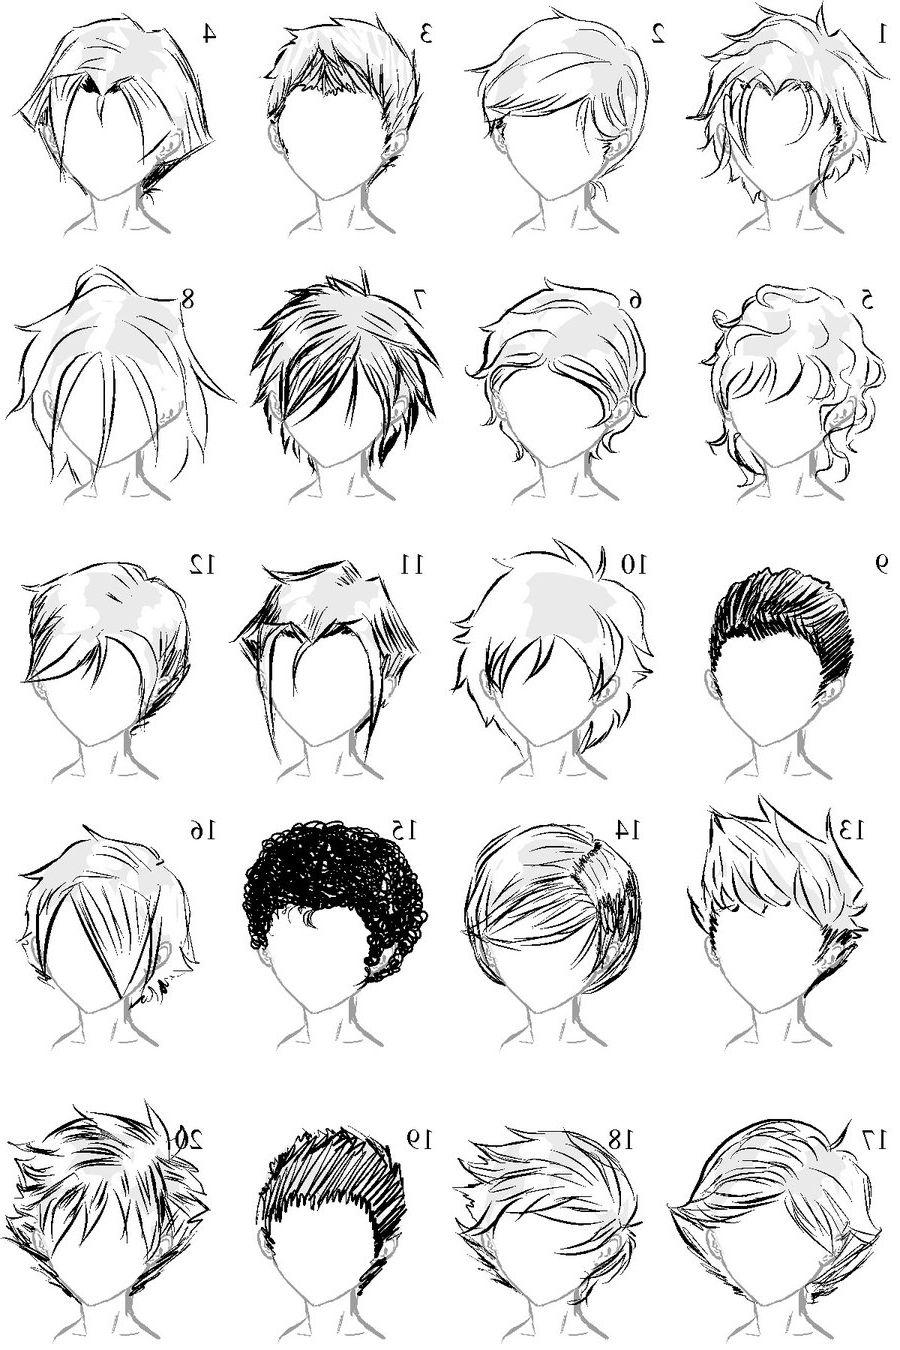 Hair Styles Anime : styles, anime, Anime, Hairstyles, Drawing, PaintingValleycom, Explore, Hair,